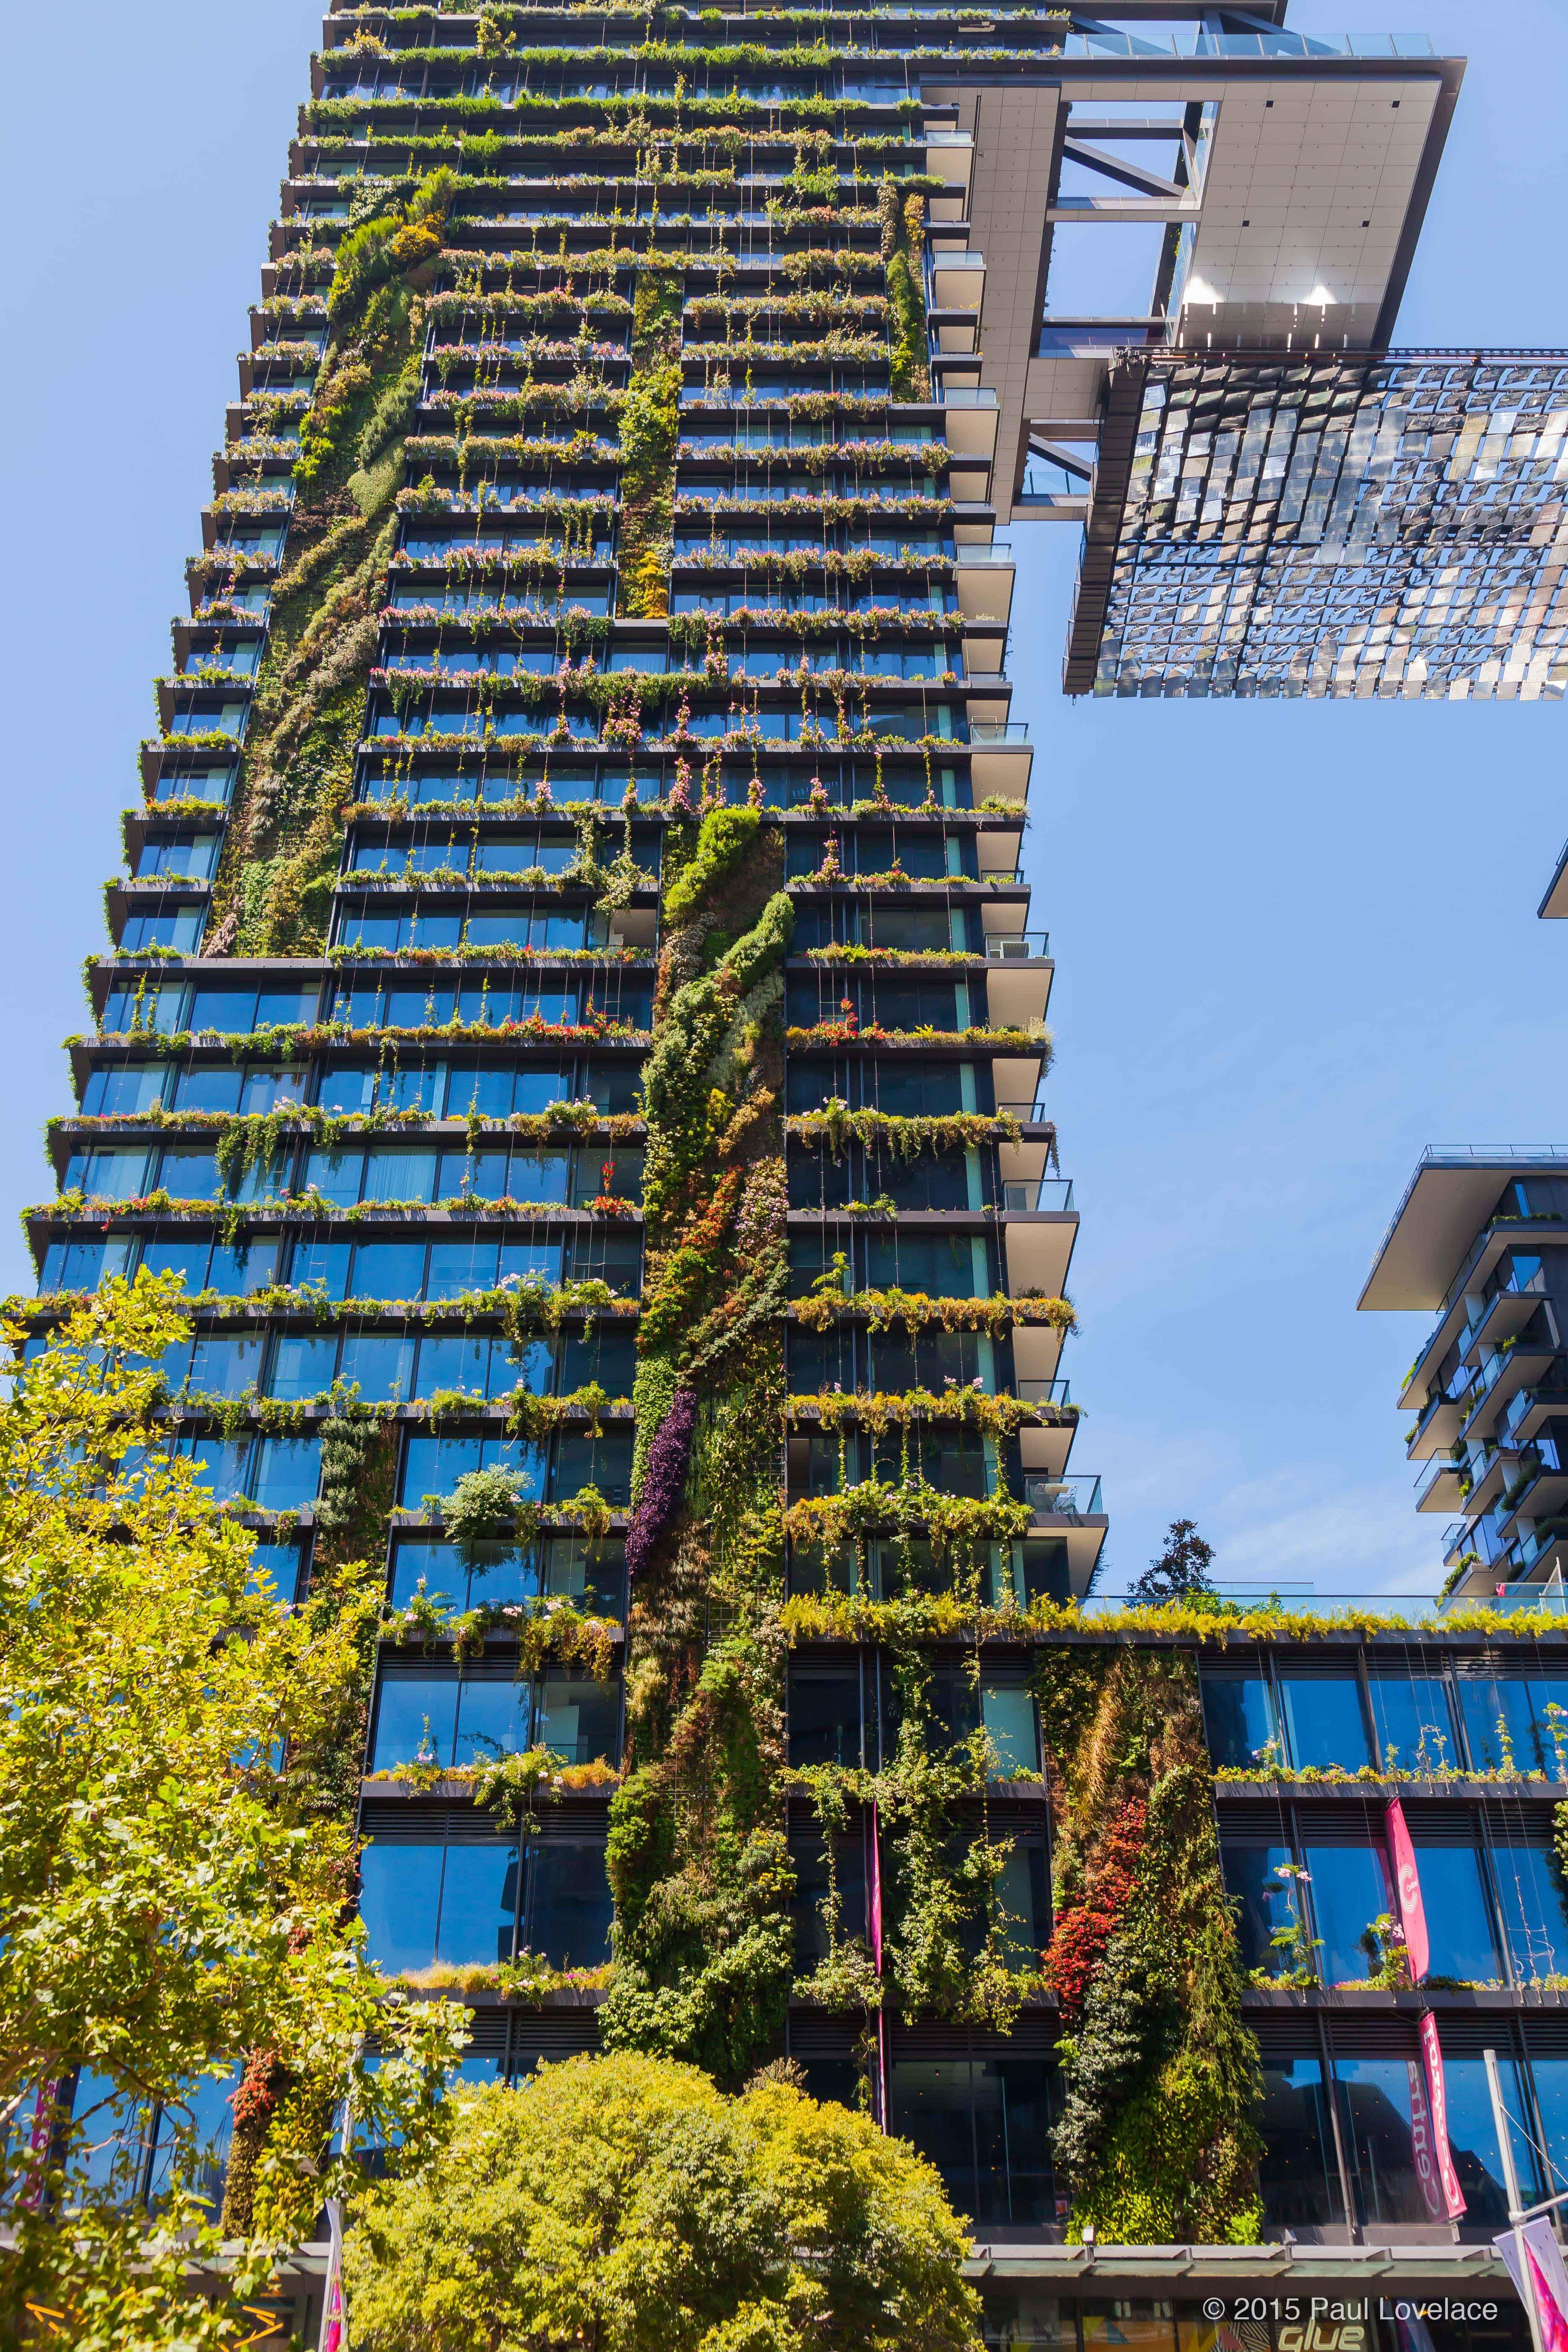 Central Park Heliostat Vertical Garden Backyard Landscaping Designs Luxury Garden